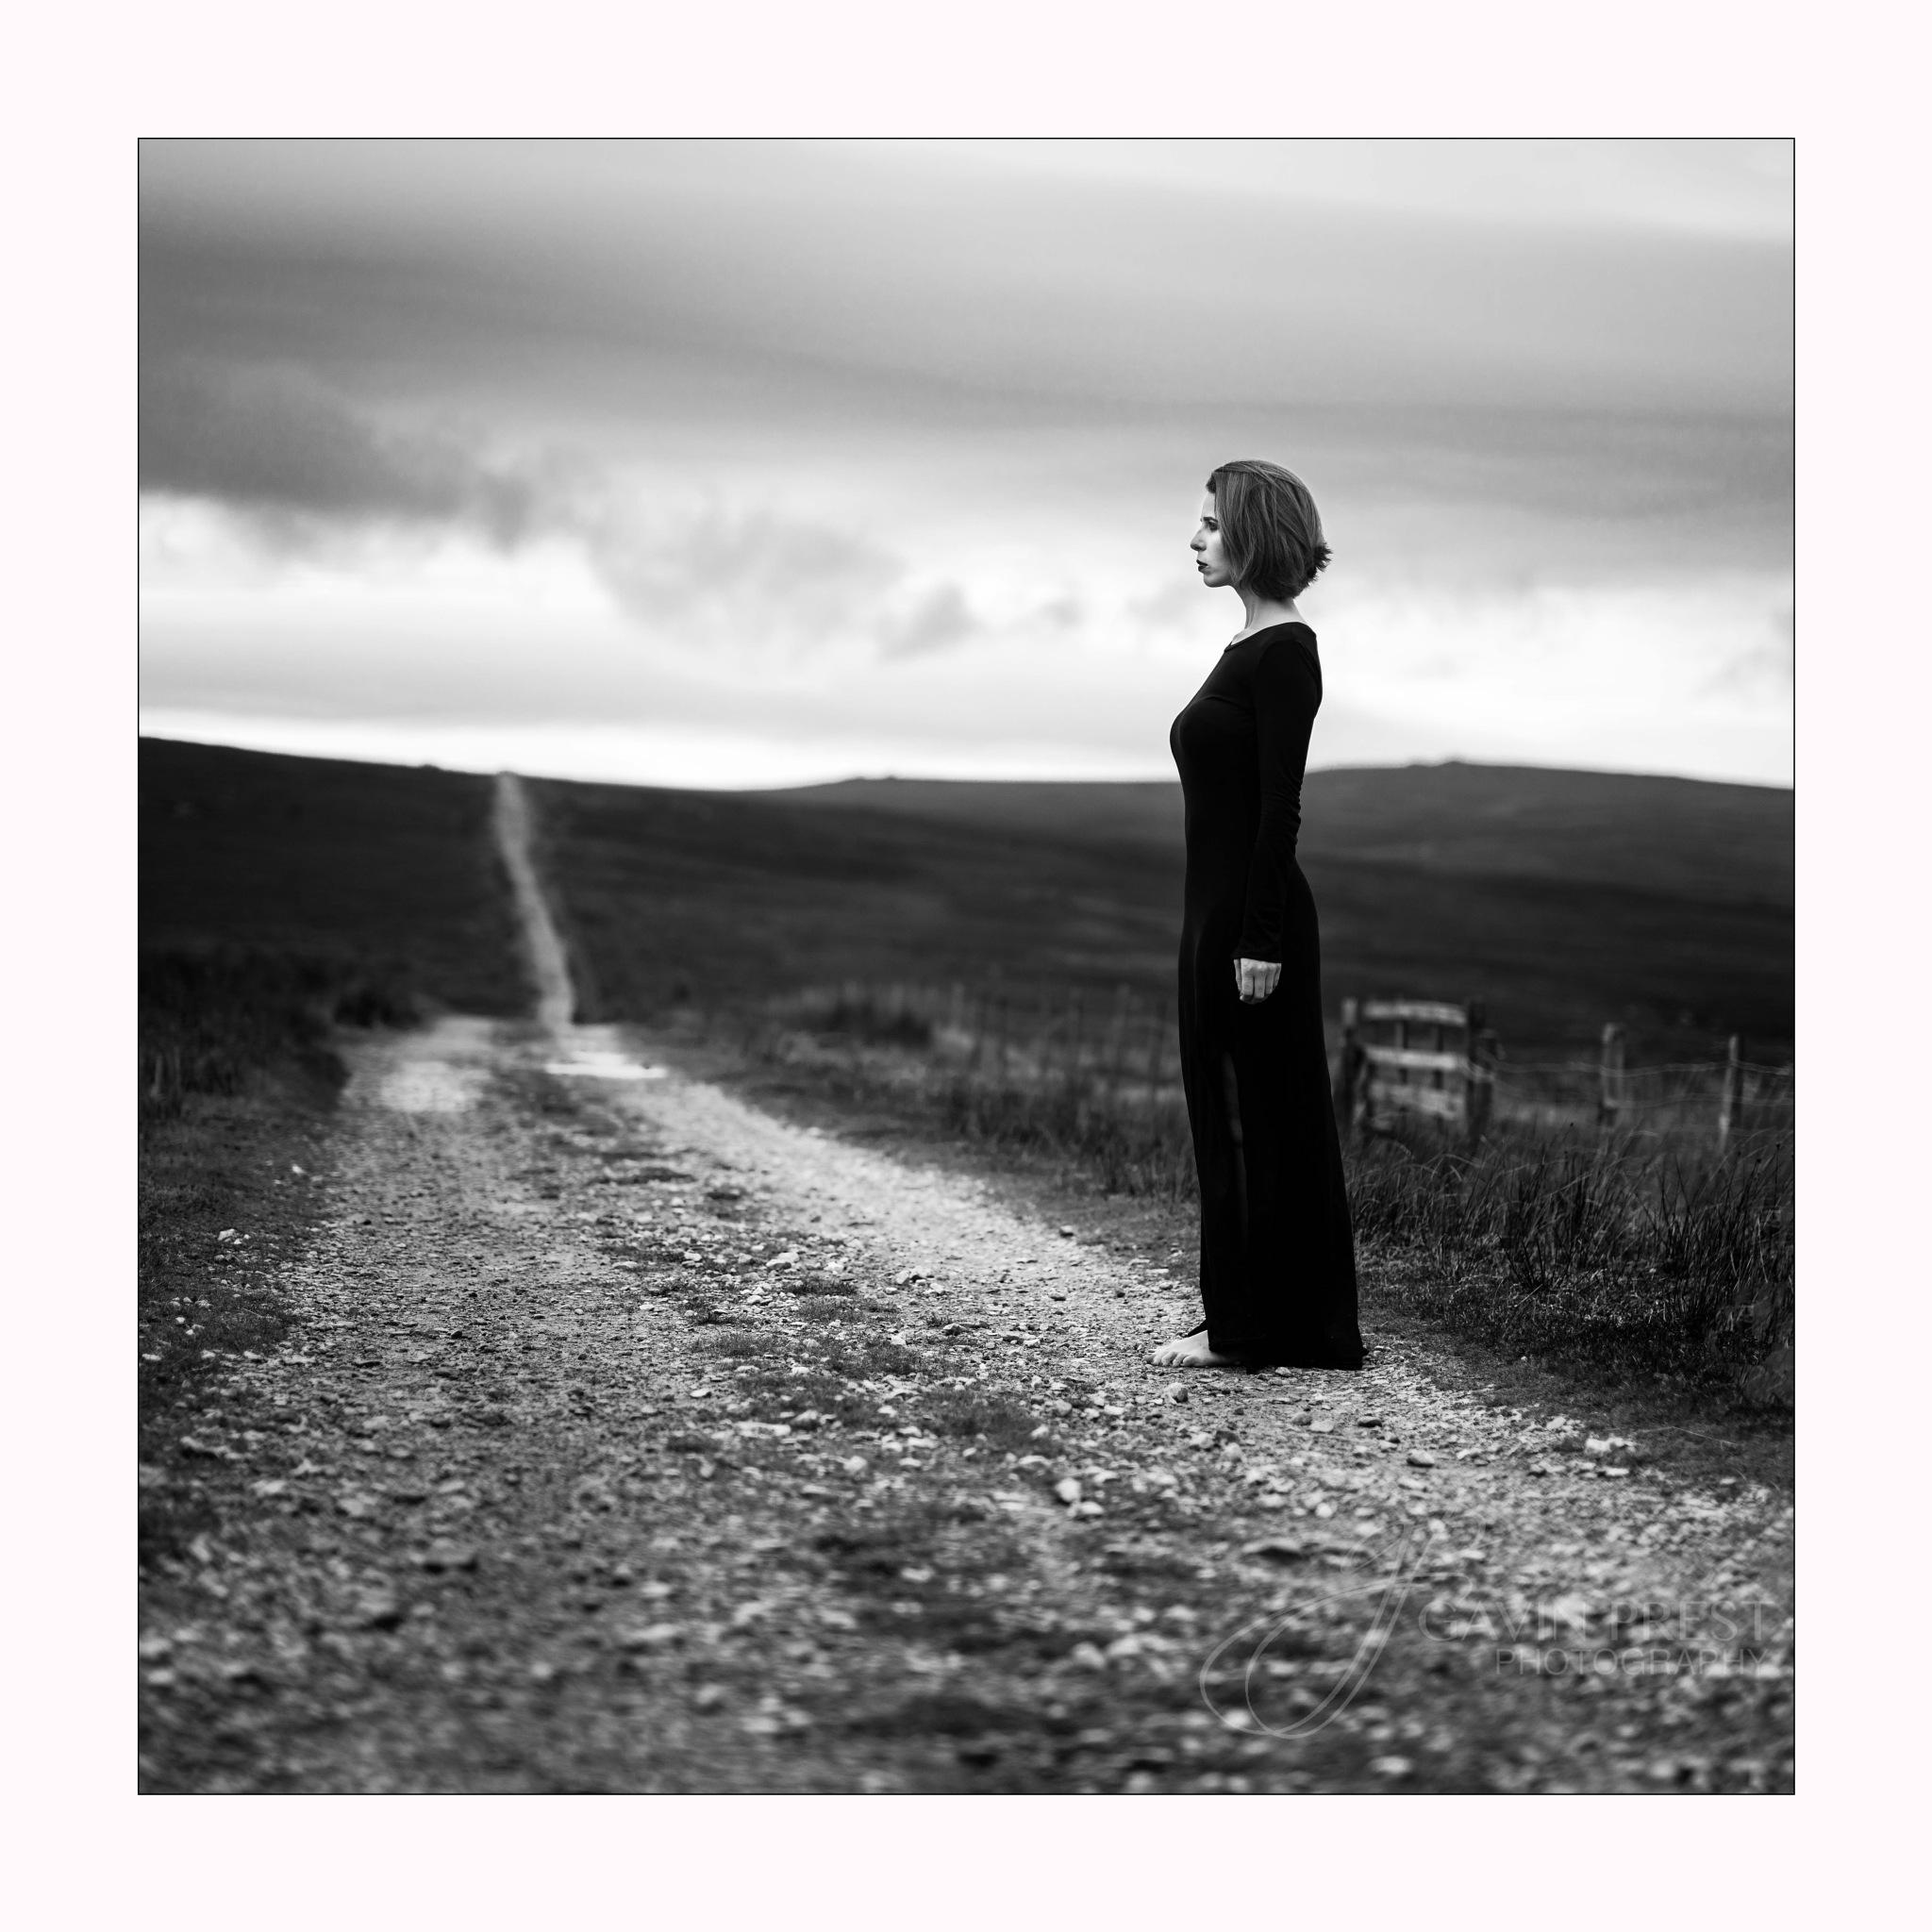 Alone by Gavin Prest